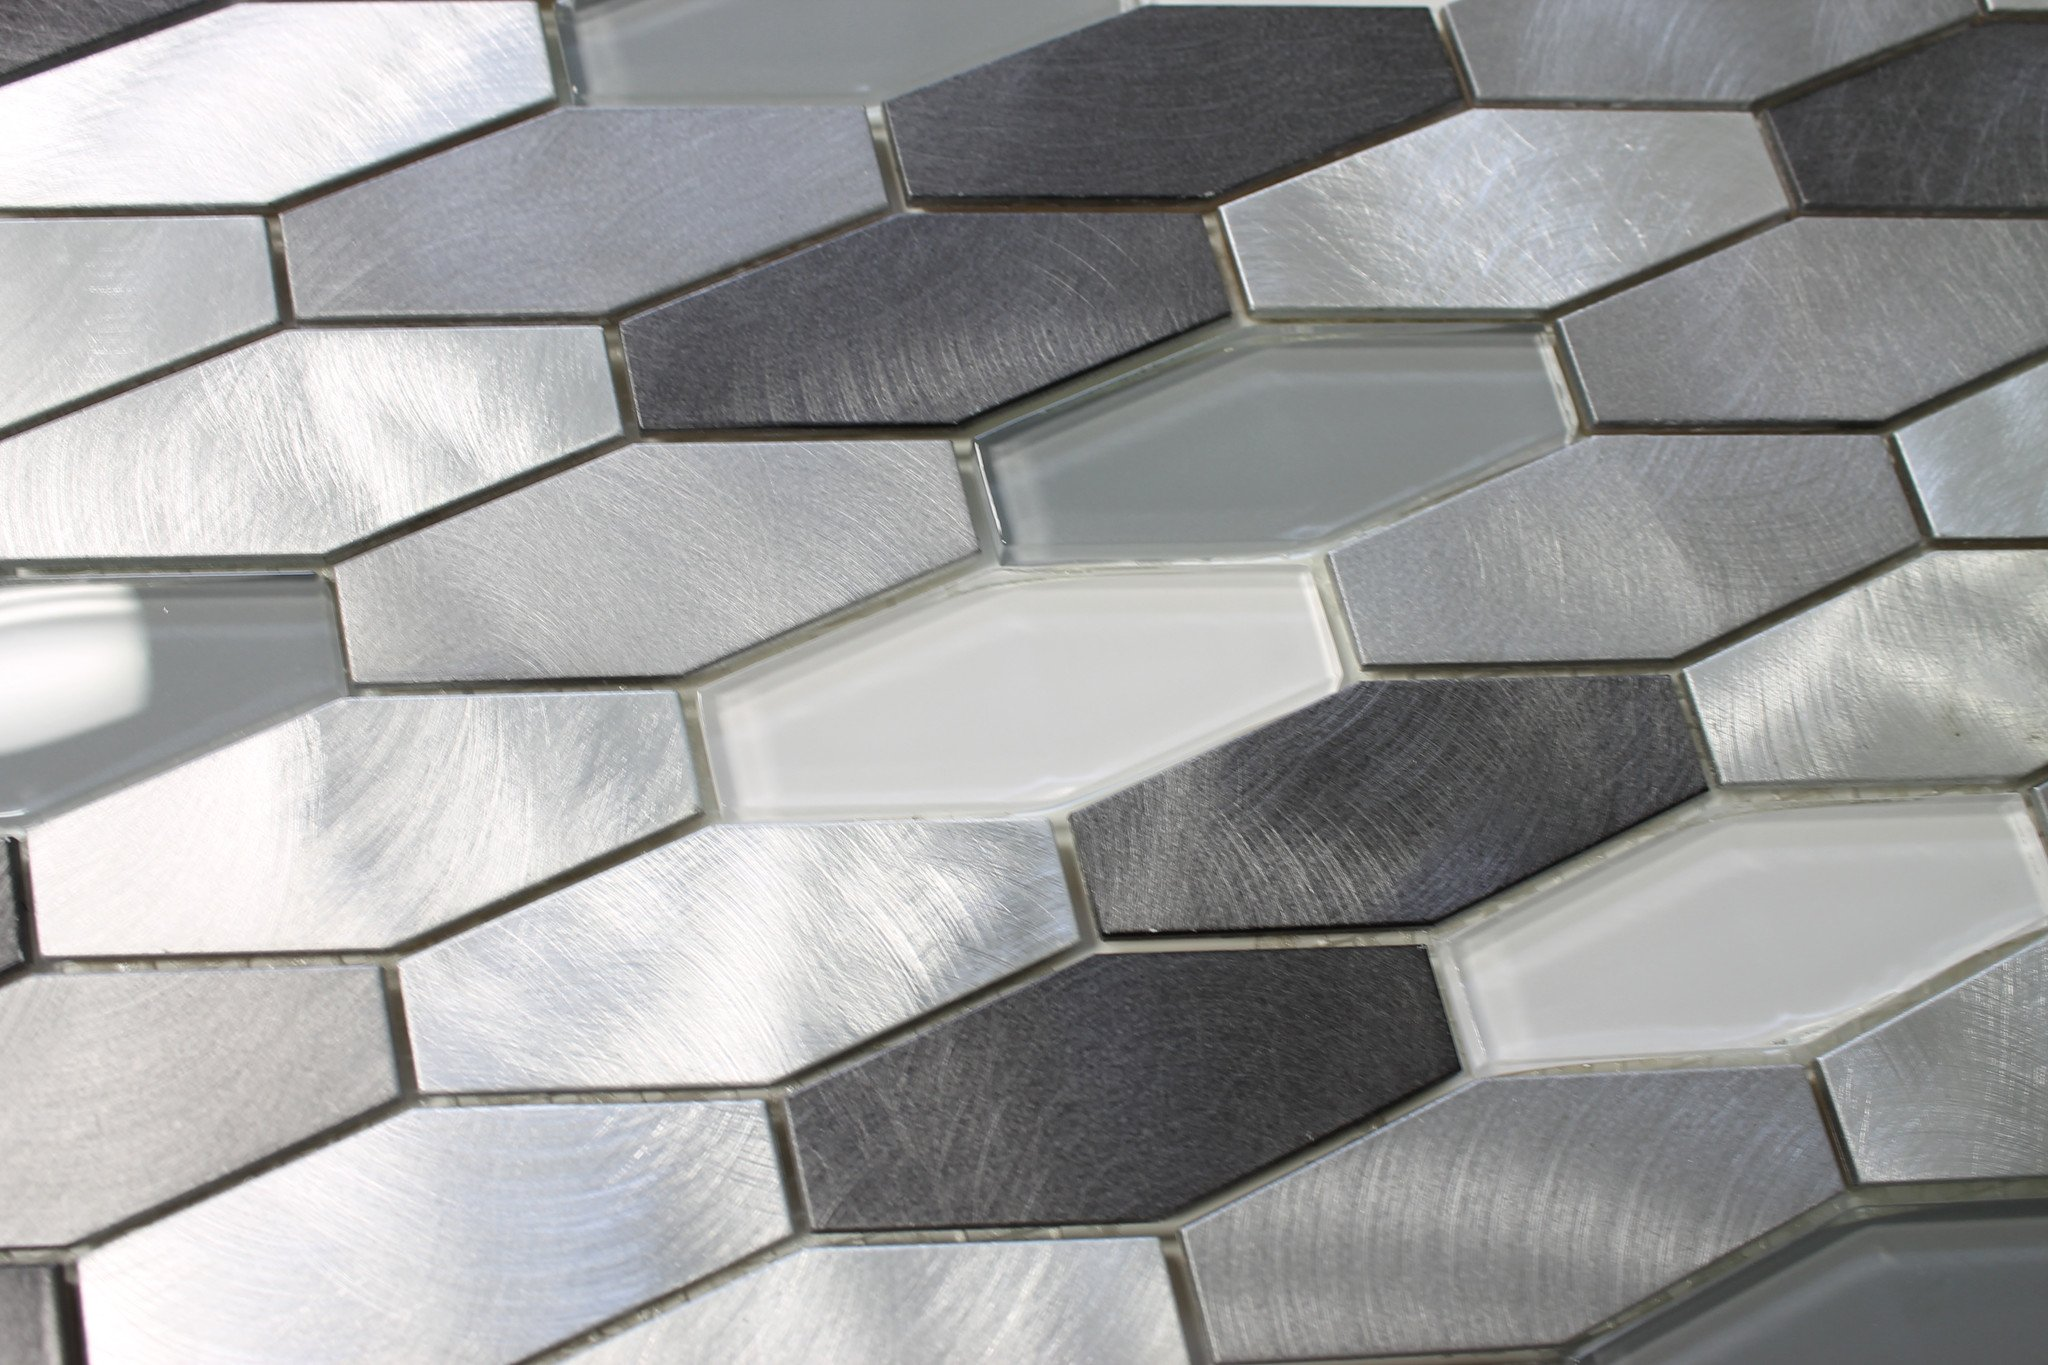 10 Square Feet - Metro Long Hexagon Brushed Aluminum and Glass Mosaic Tiles